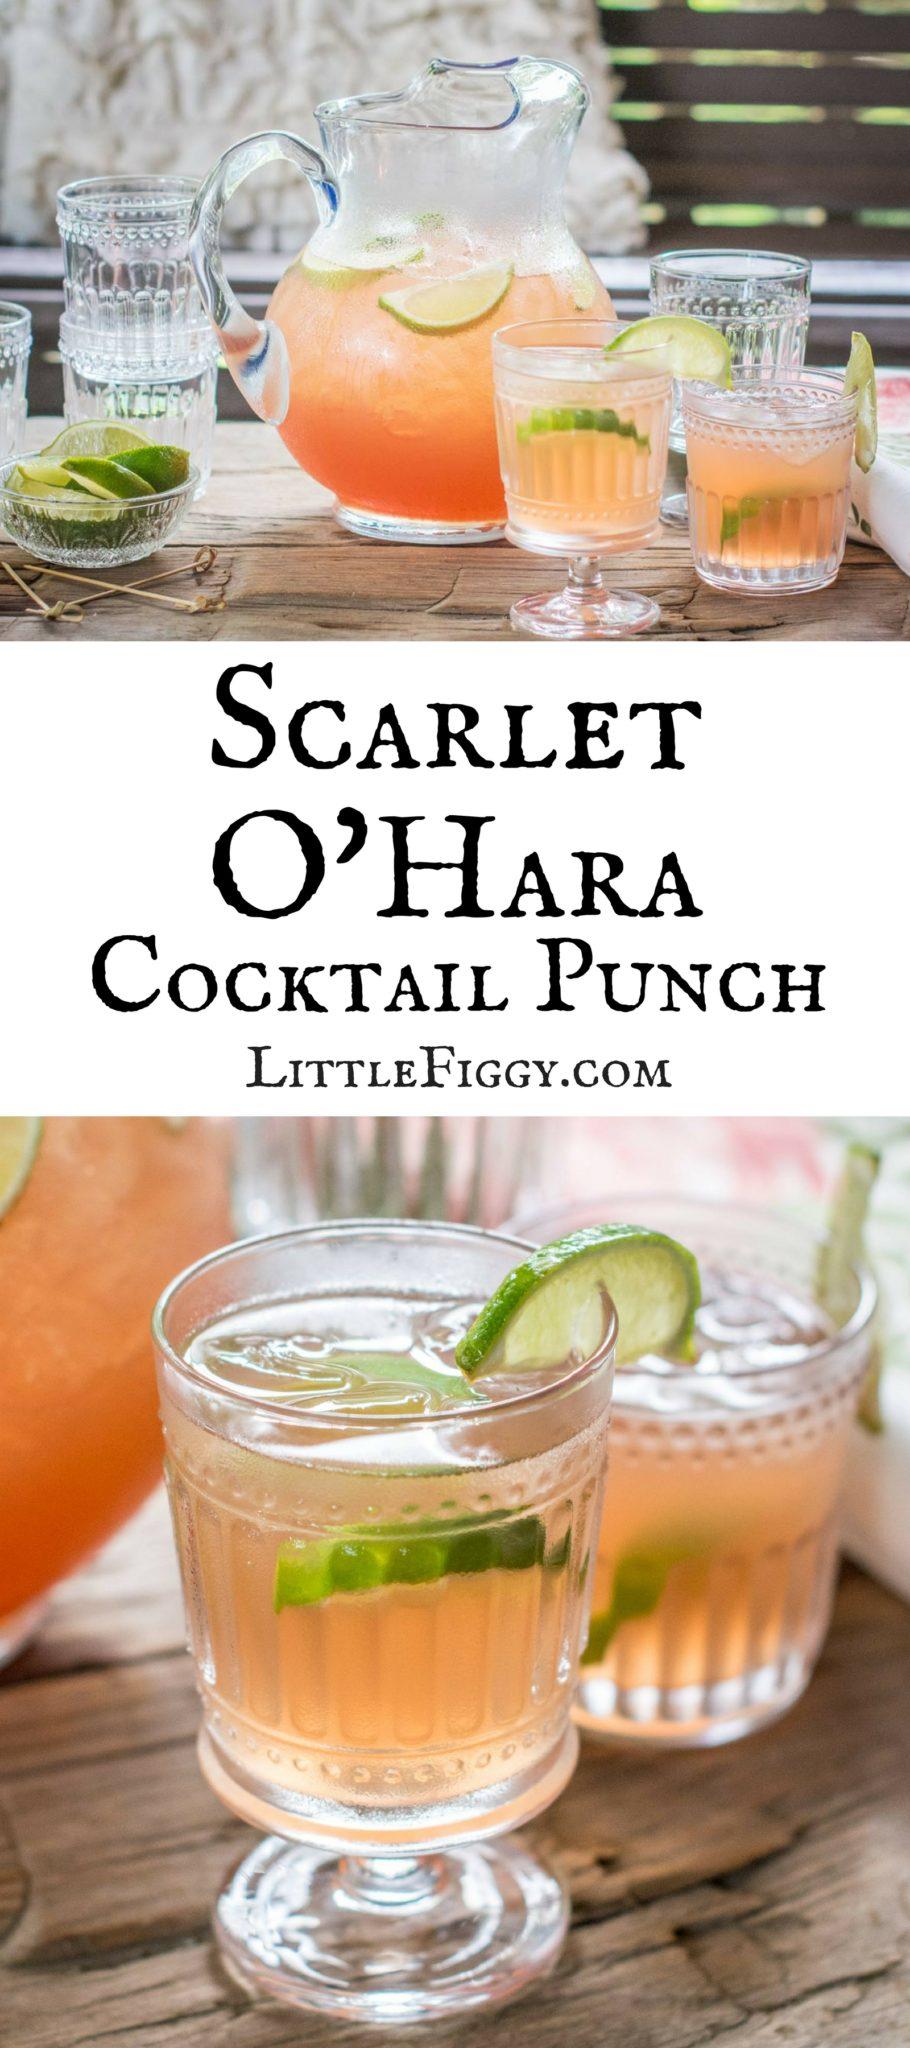 Scarlet O'Hara Cocktail Punch ready to enjoy! @WorldMarket #WorldMarketCMA #CMAFest #ad